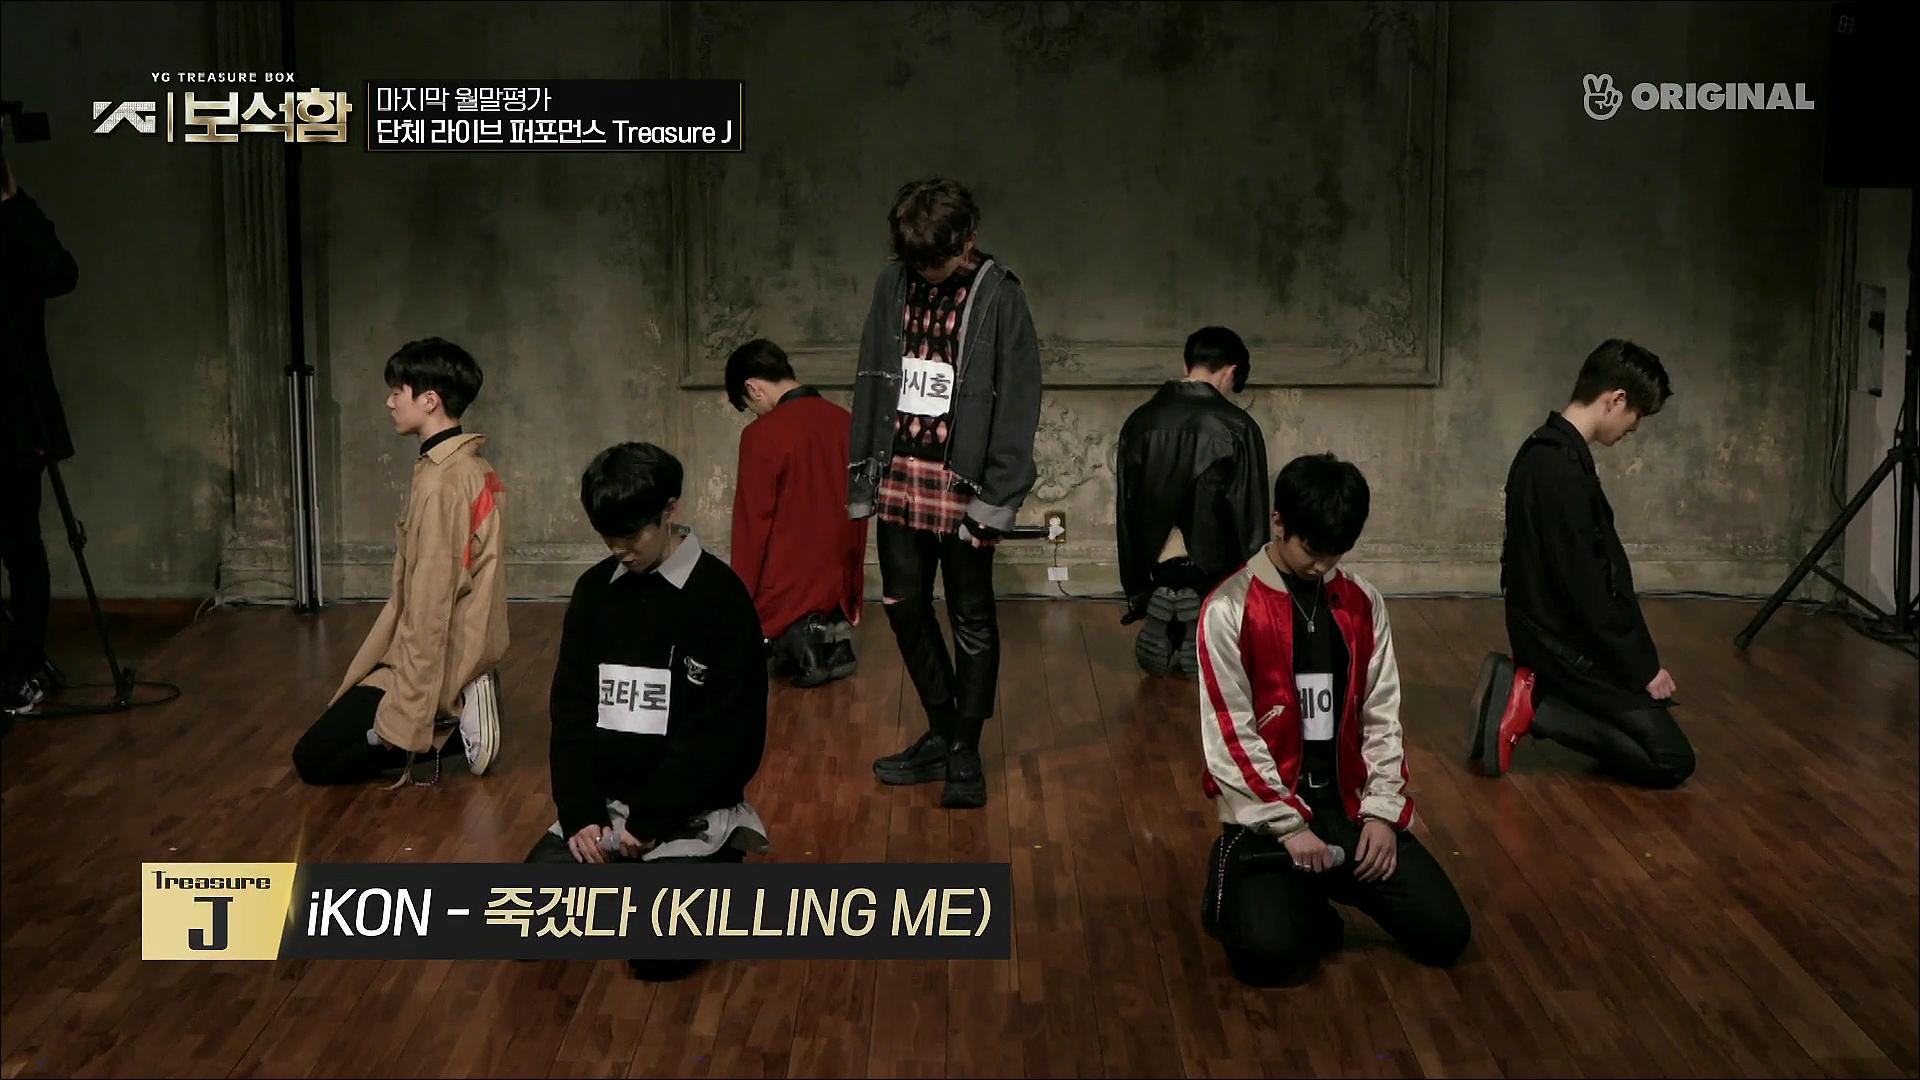 [Treasure J] 단체 라이브 퍼포먼스|iKON - 죽겠다ㅣYG 보석함 EP.03